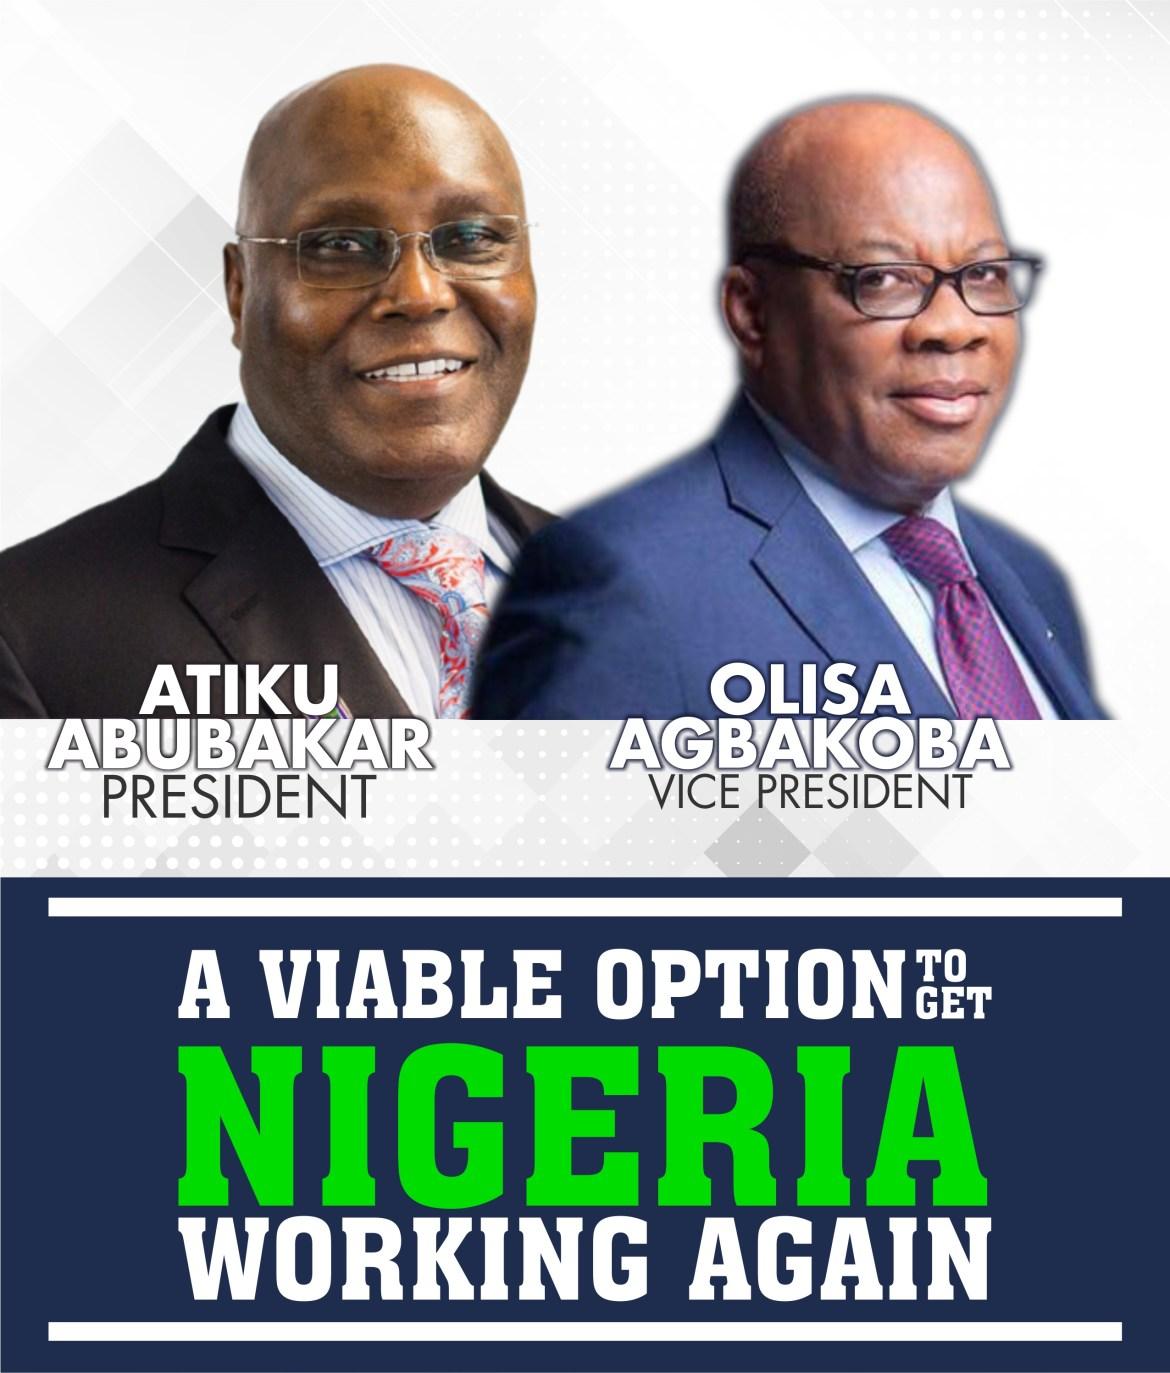 10 Things to Know About Atiku's Running Mate, Olisa Agbakoba